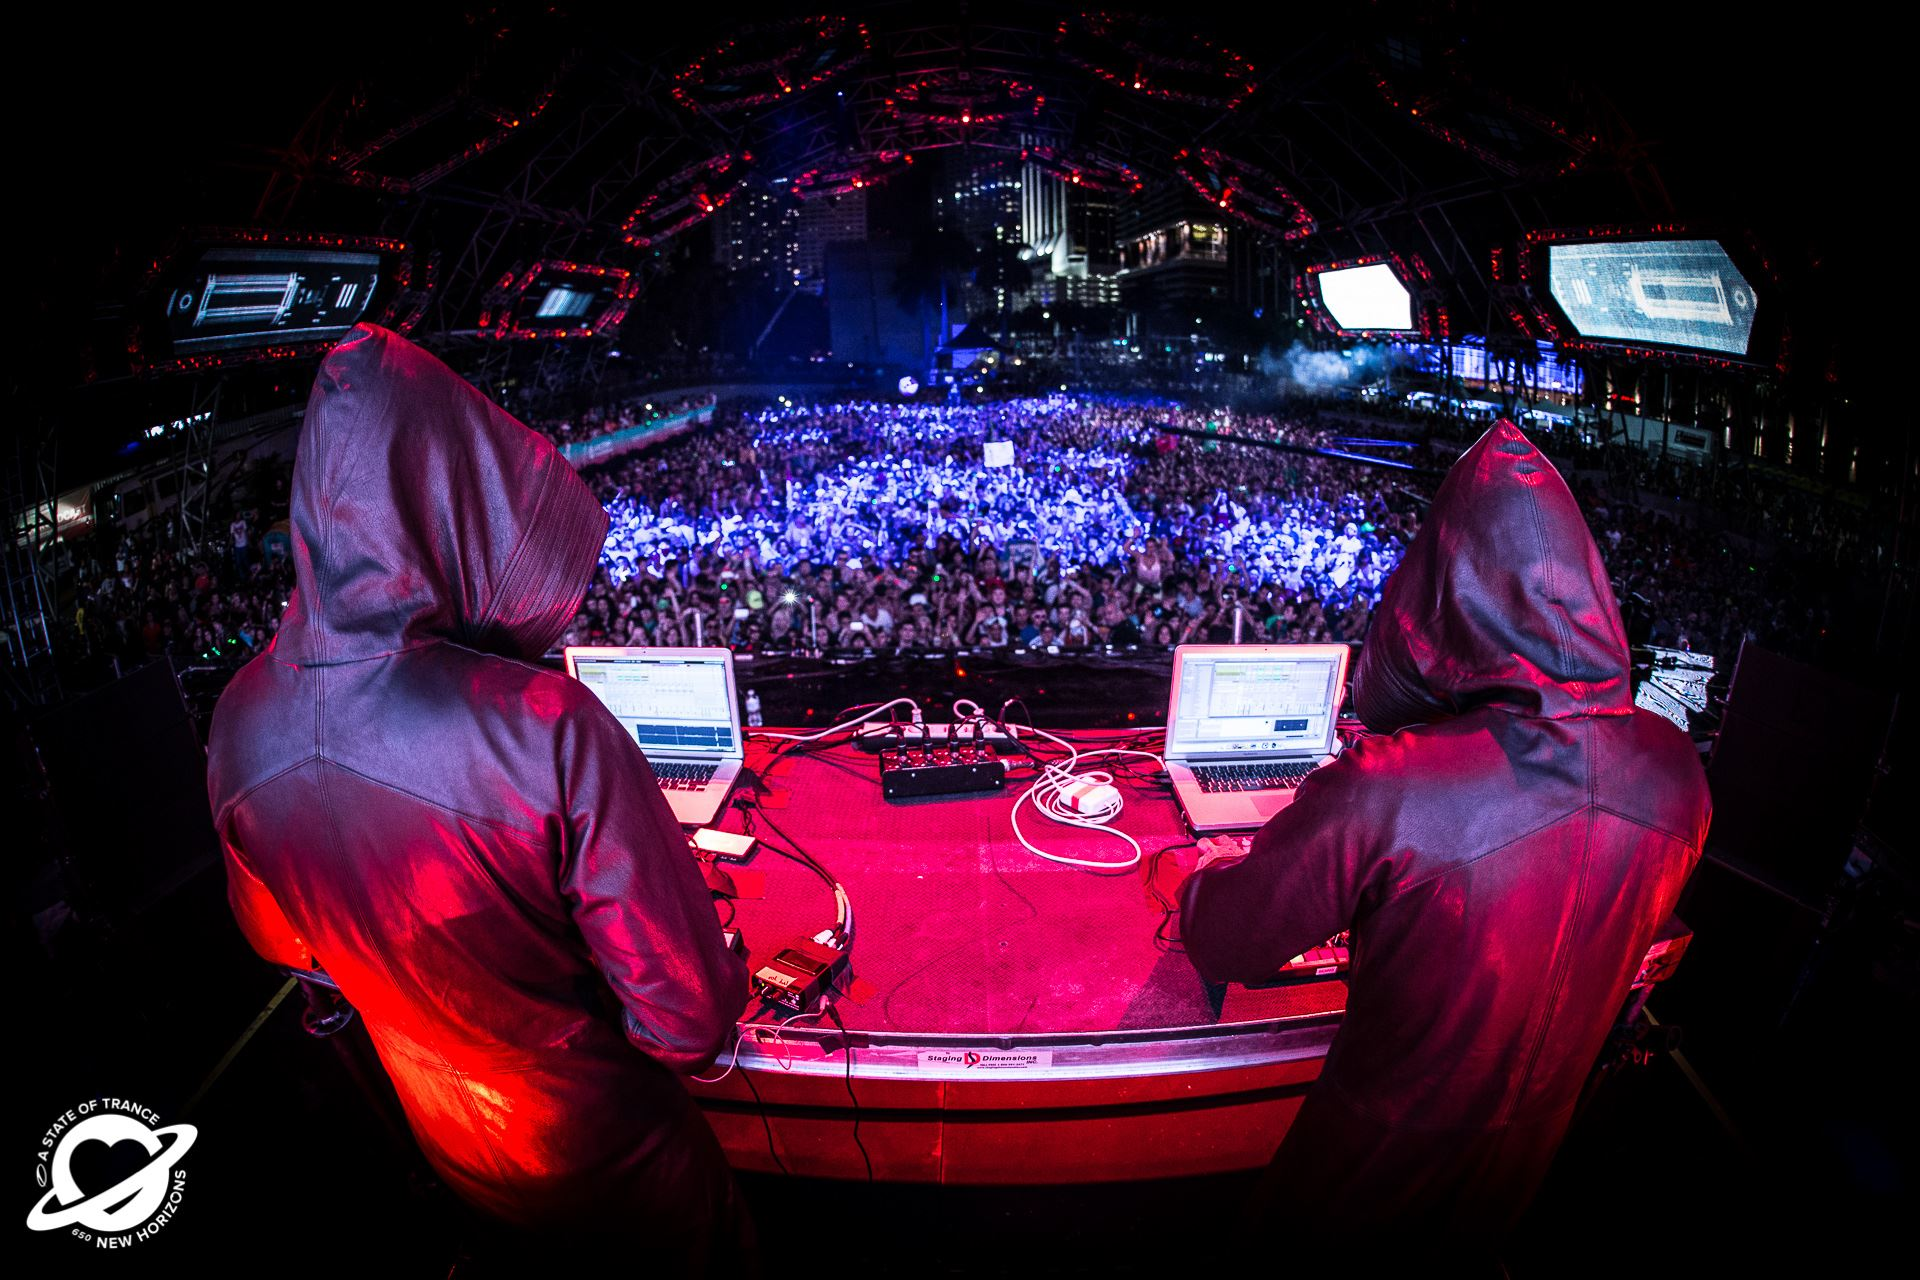 Armin van Buuren Debuts GAIA At Ultra Music Festival (with live set)